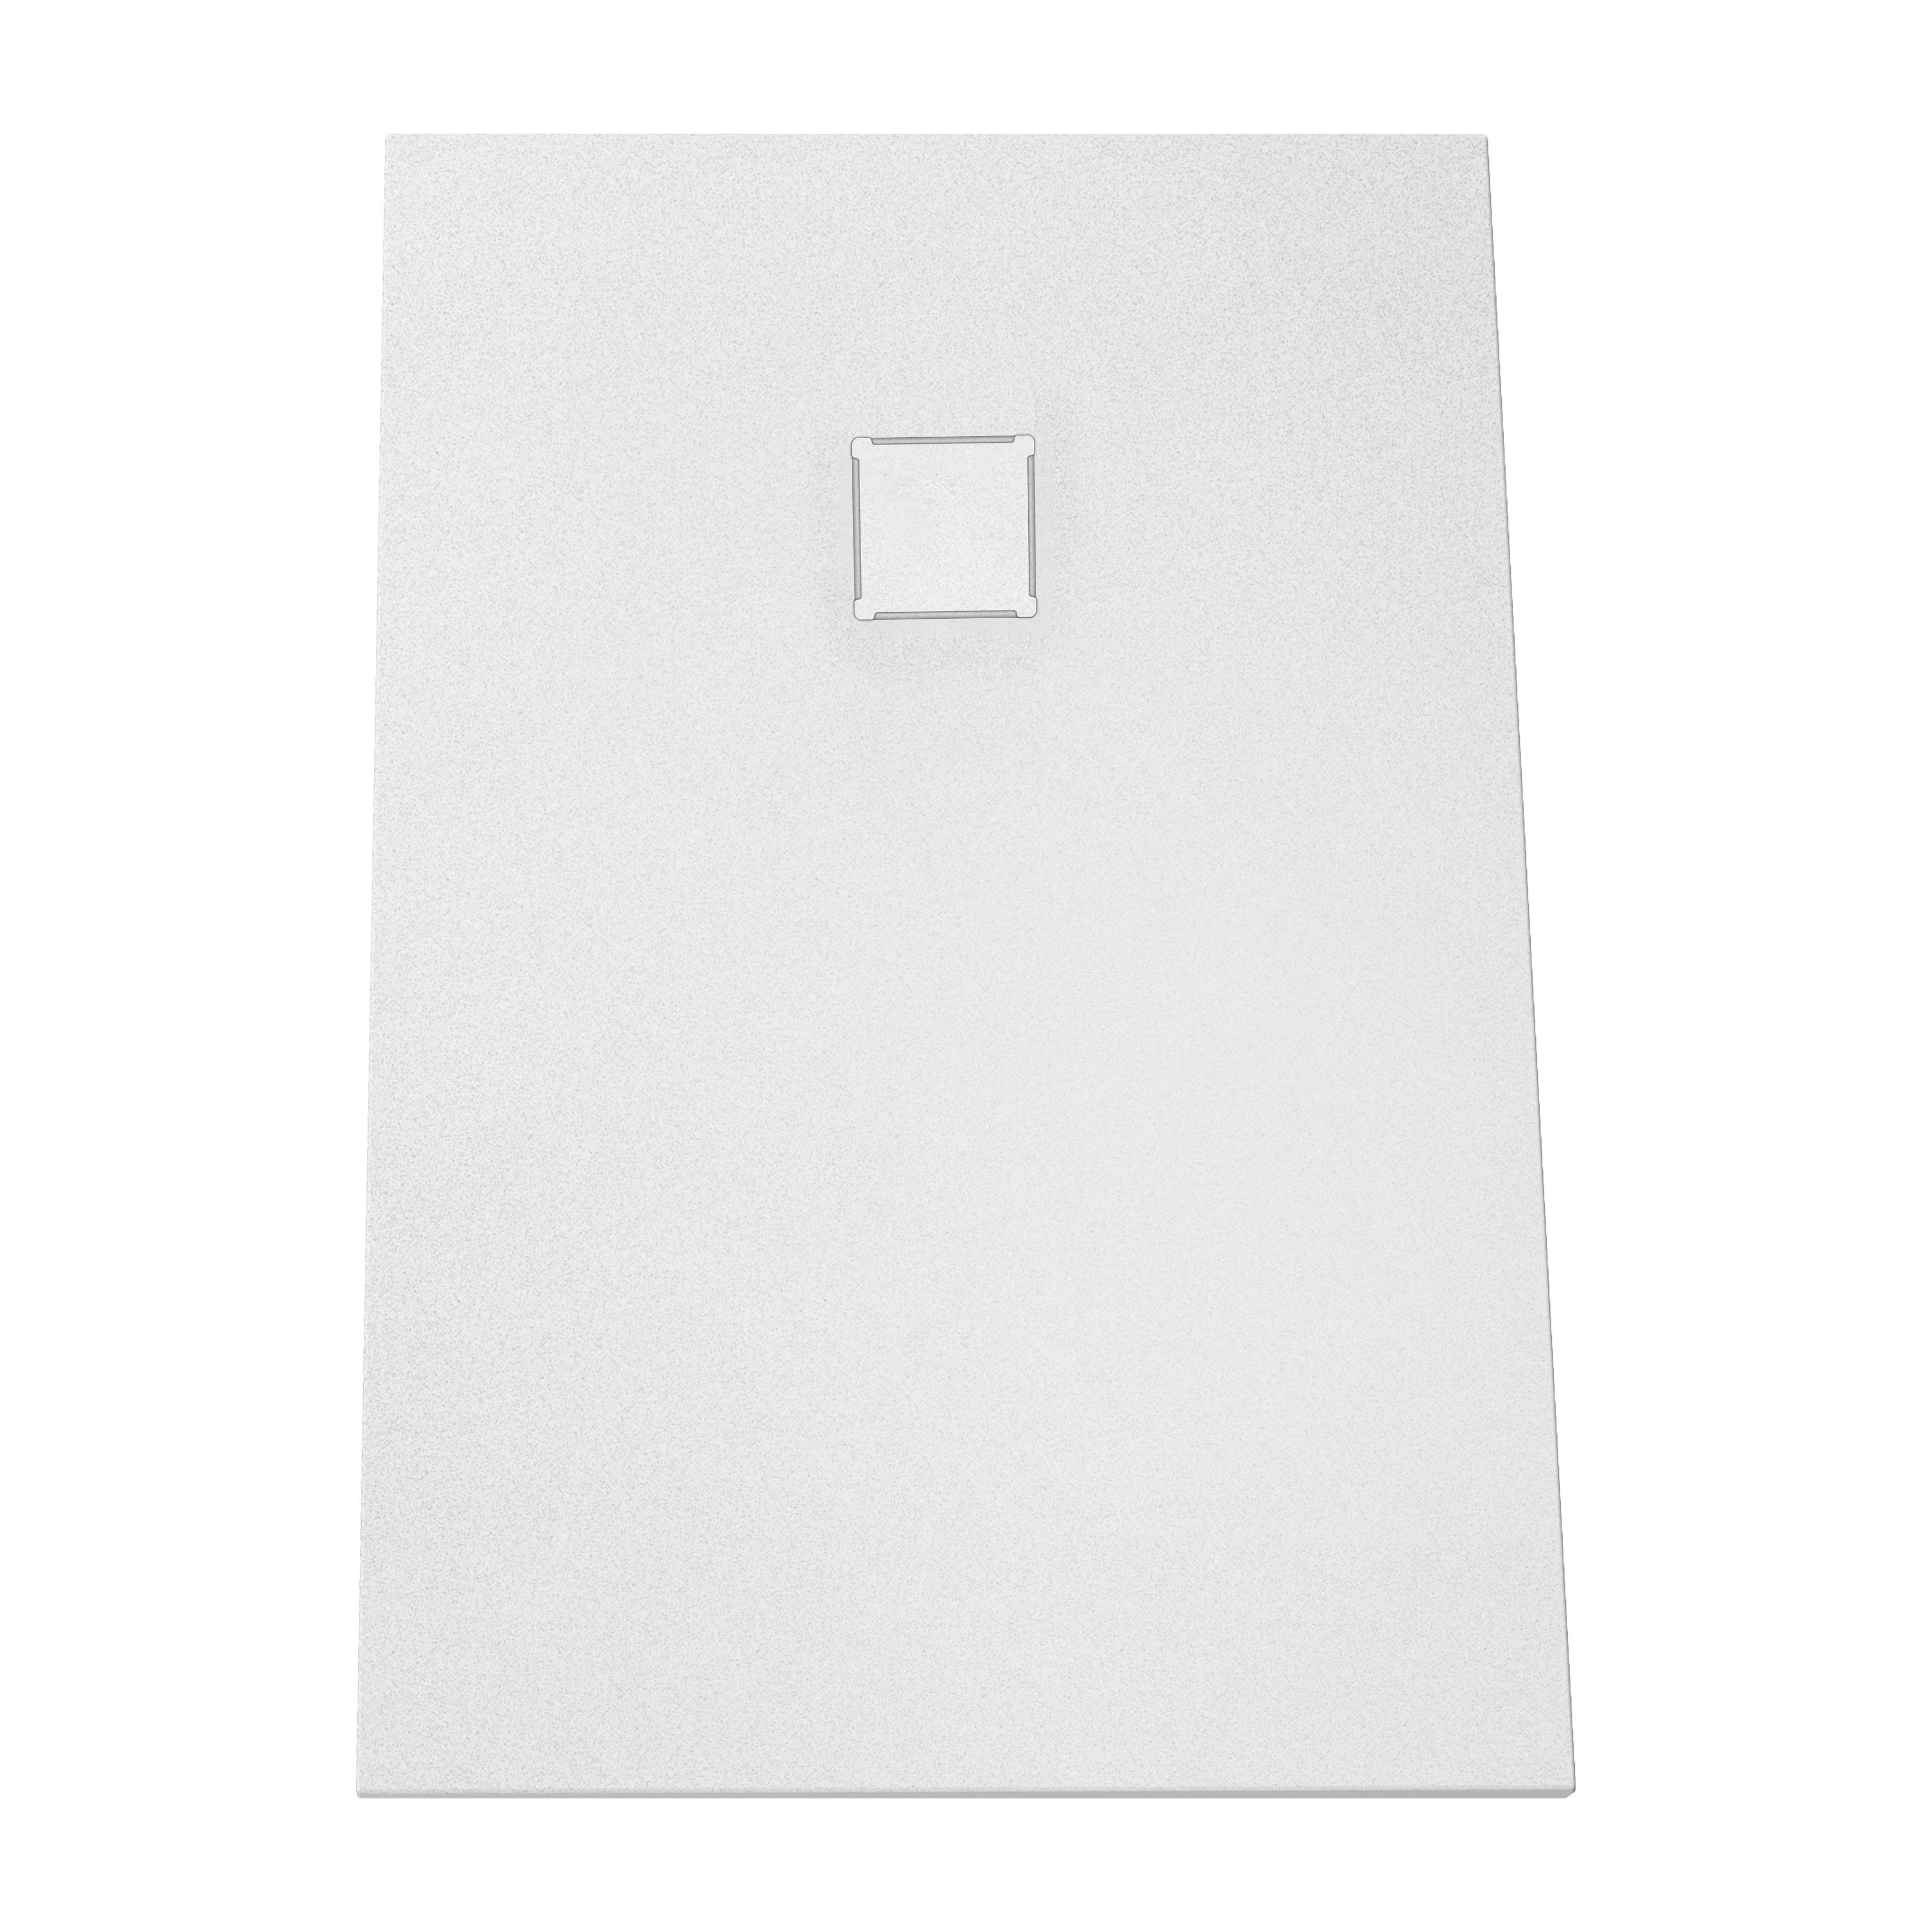 V-stone, receveur ultra plat en solid stone, 120  x  80 cm blanc